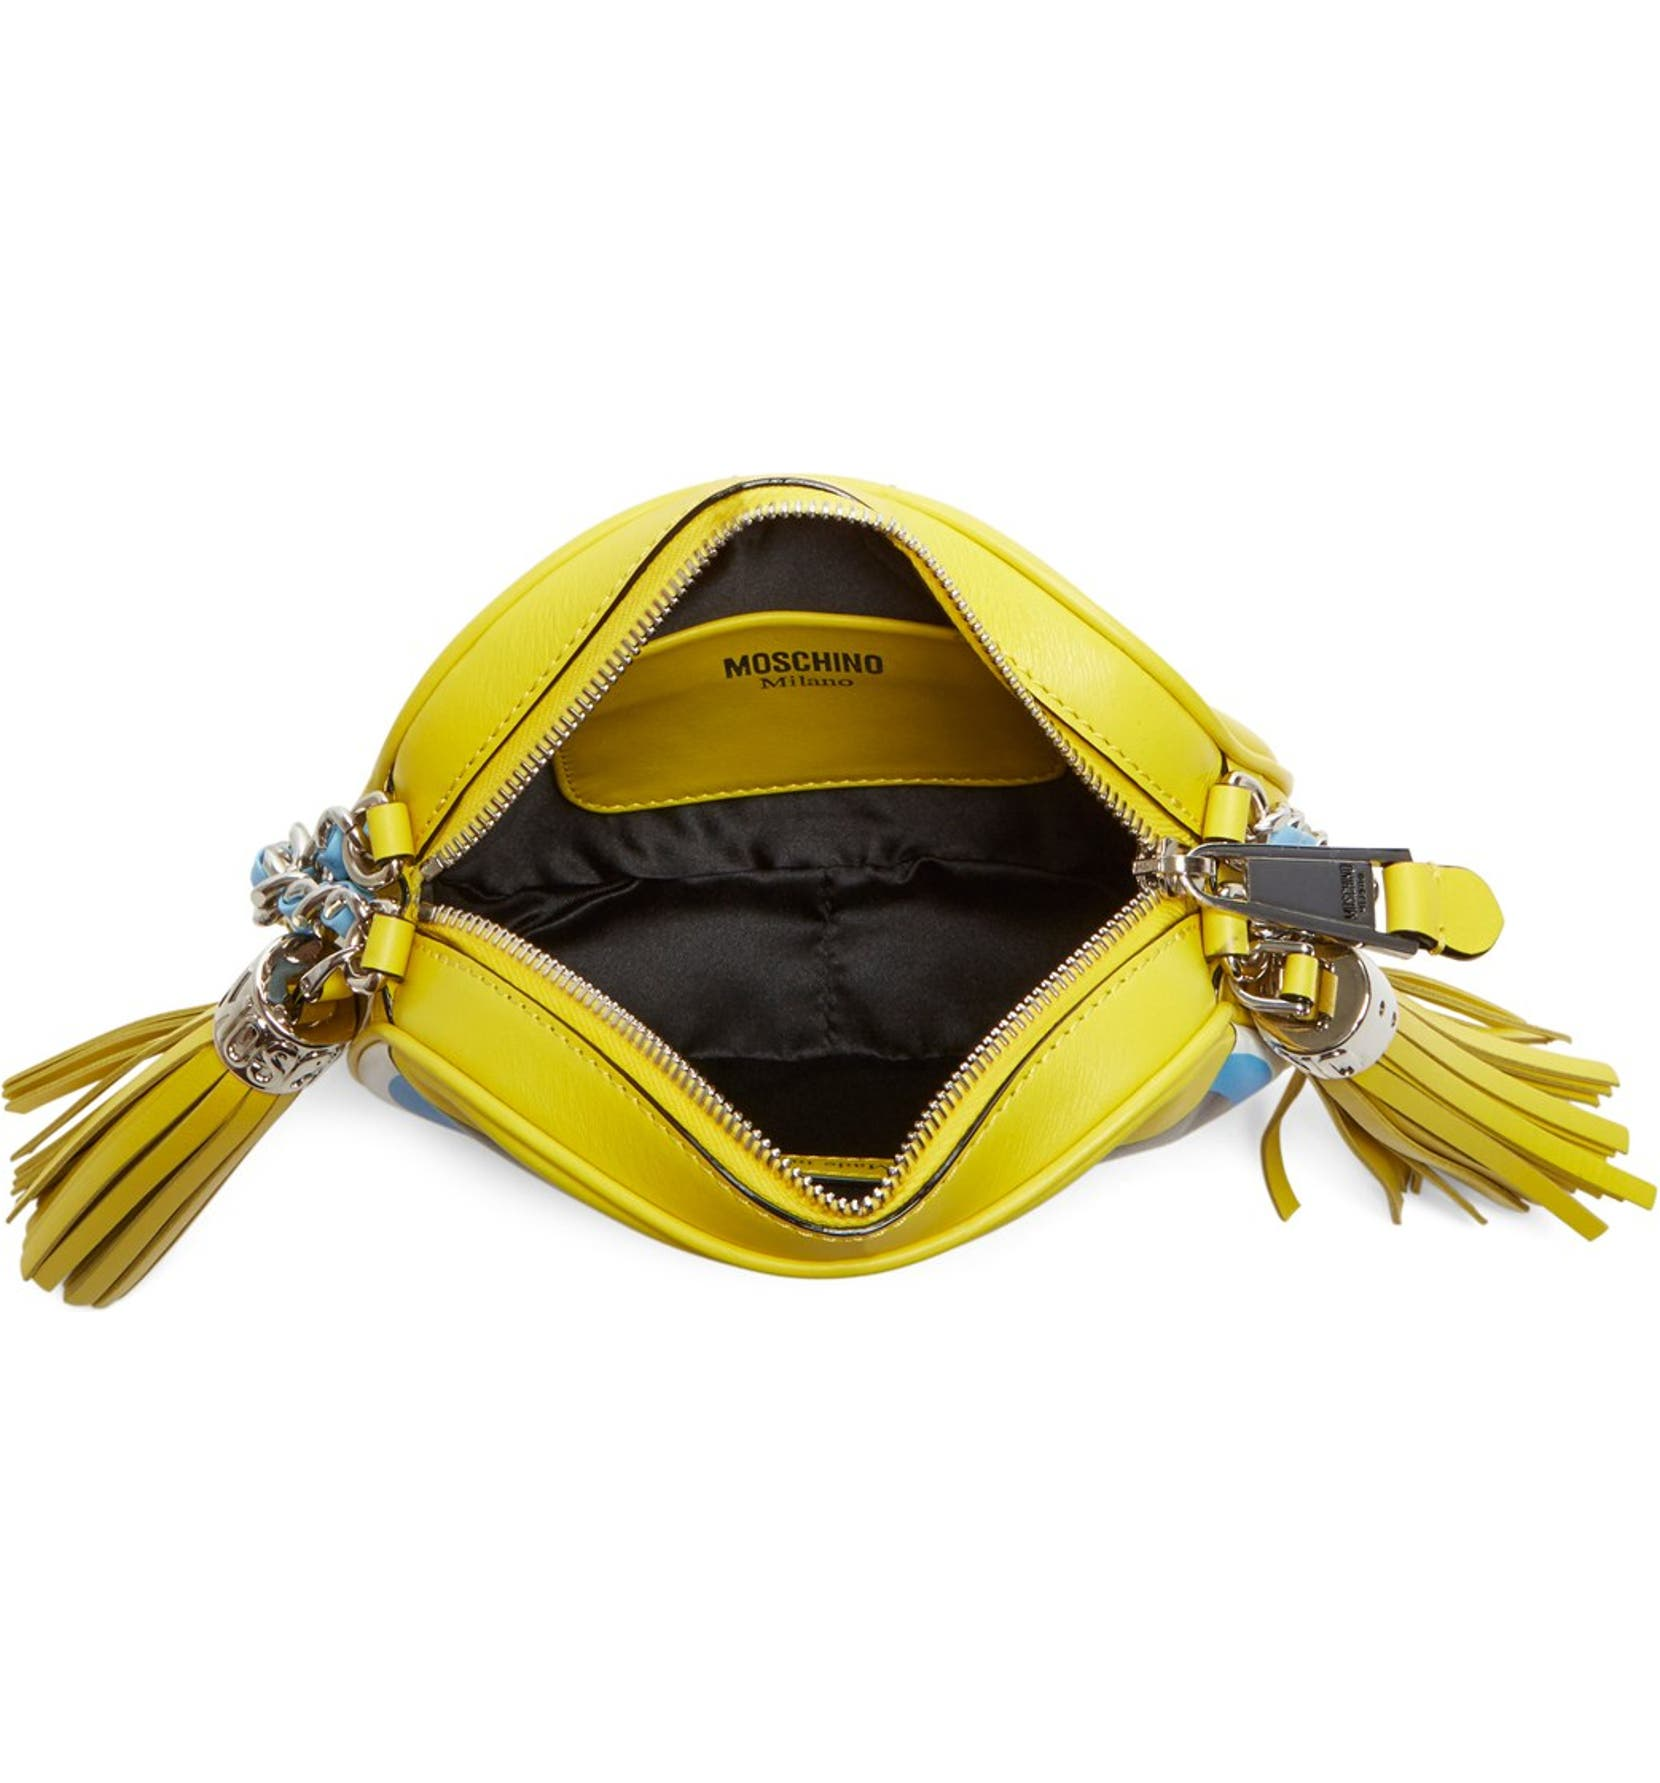 4ad3f22871 Moschino 'The Powerpuff Girls® - Bubbles' Canteen Crossbody Bag   Nordstrom